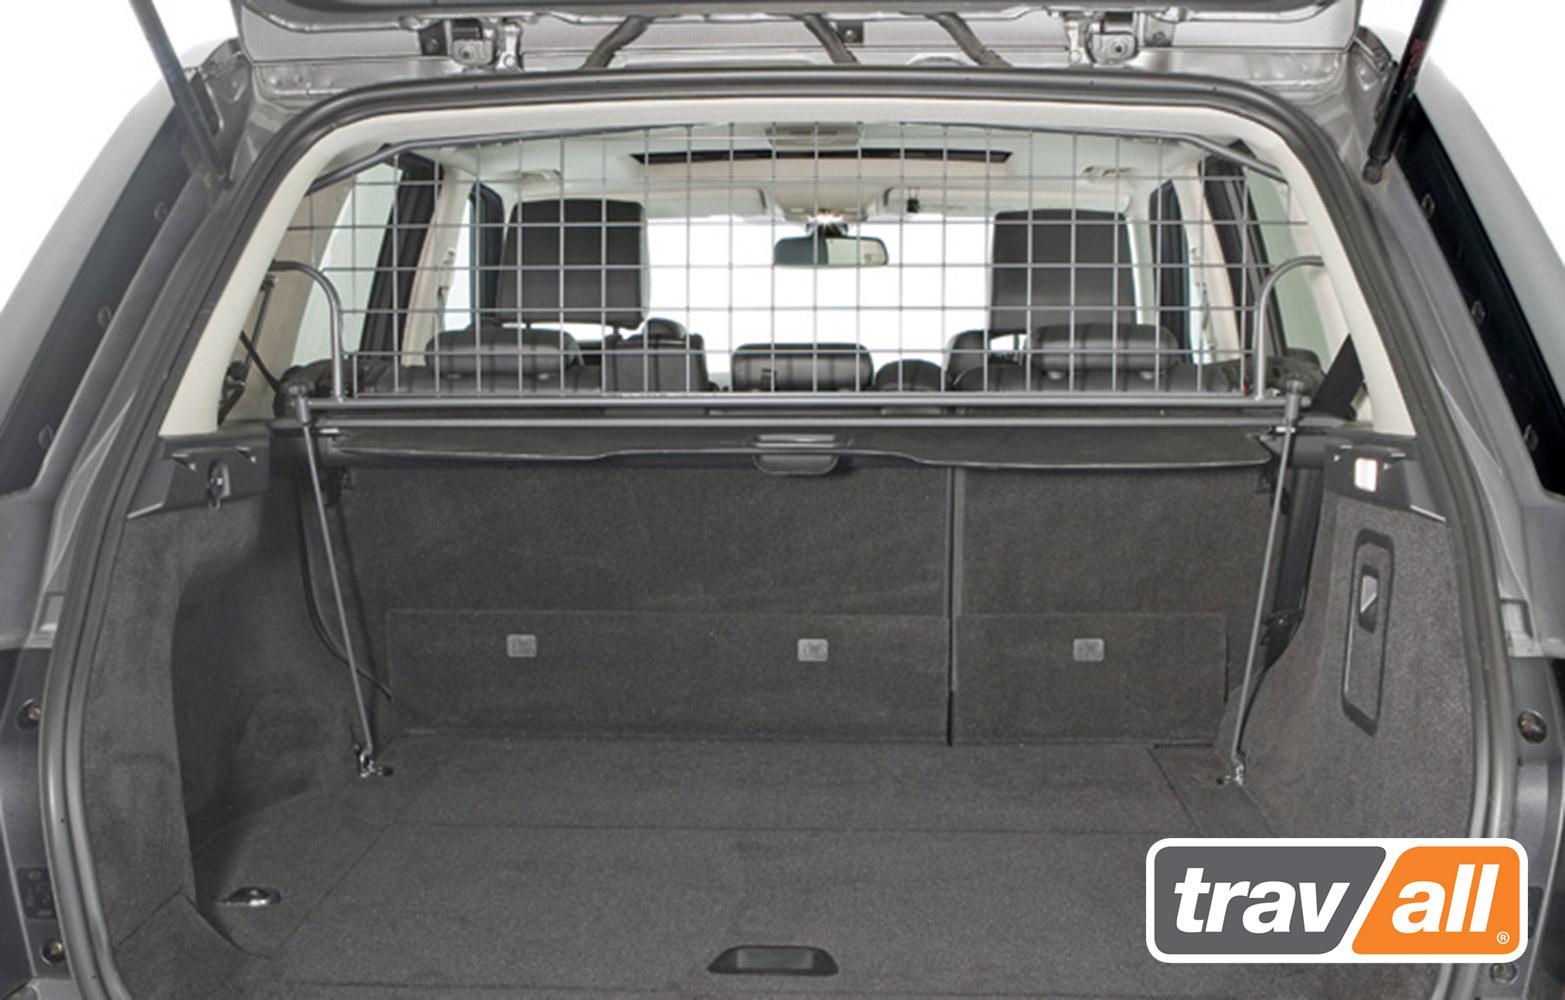 Genuine Travall Dog Guards Land Rover Range Rover Sport